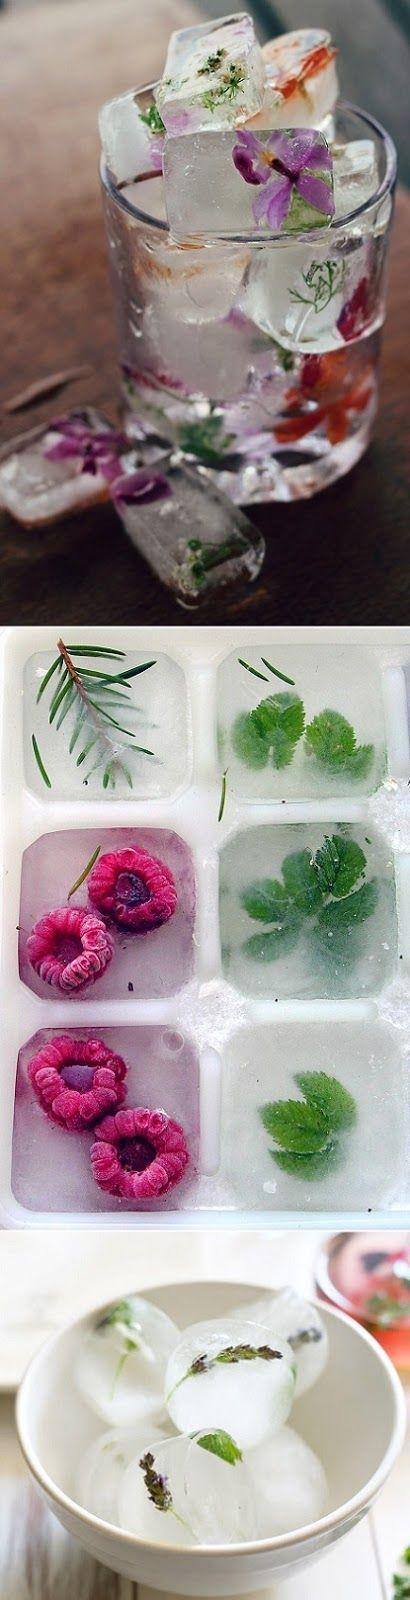 Cubitos Comestibles de Flores | Edible Flower Ice Cubes #creativerecipes